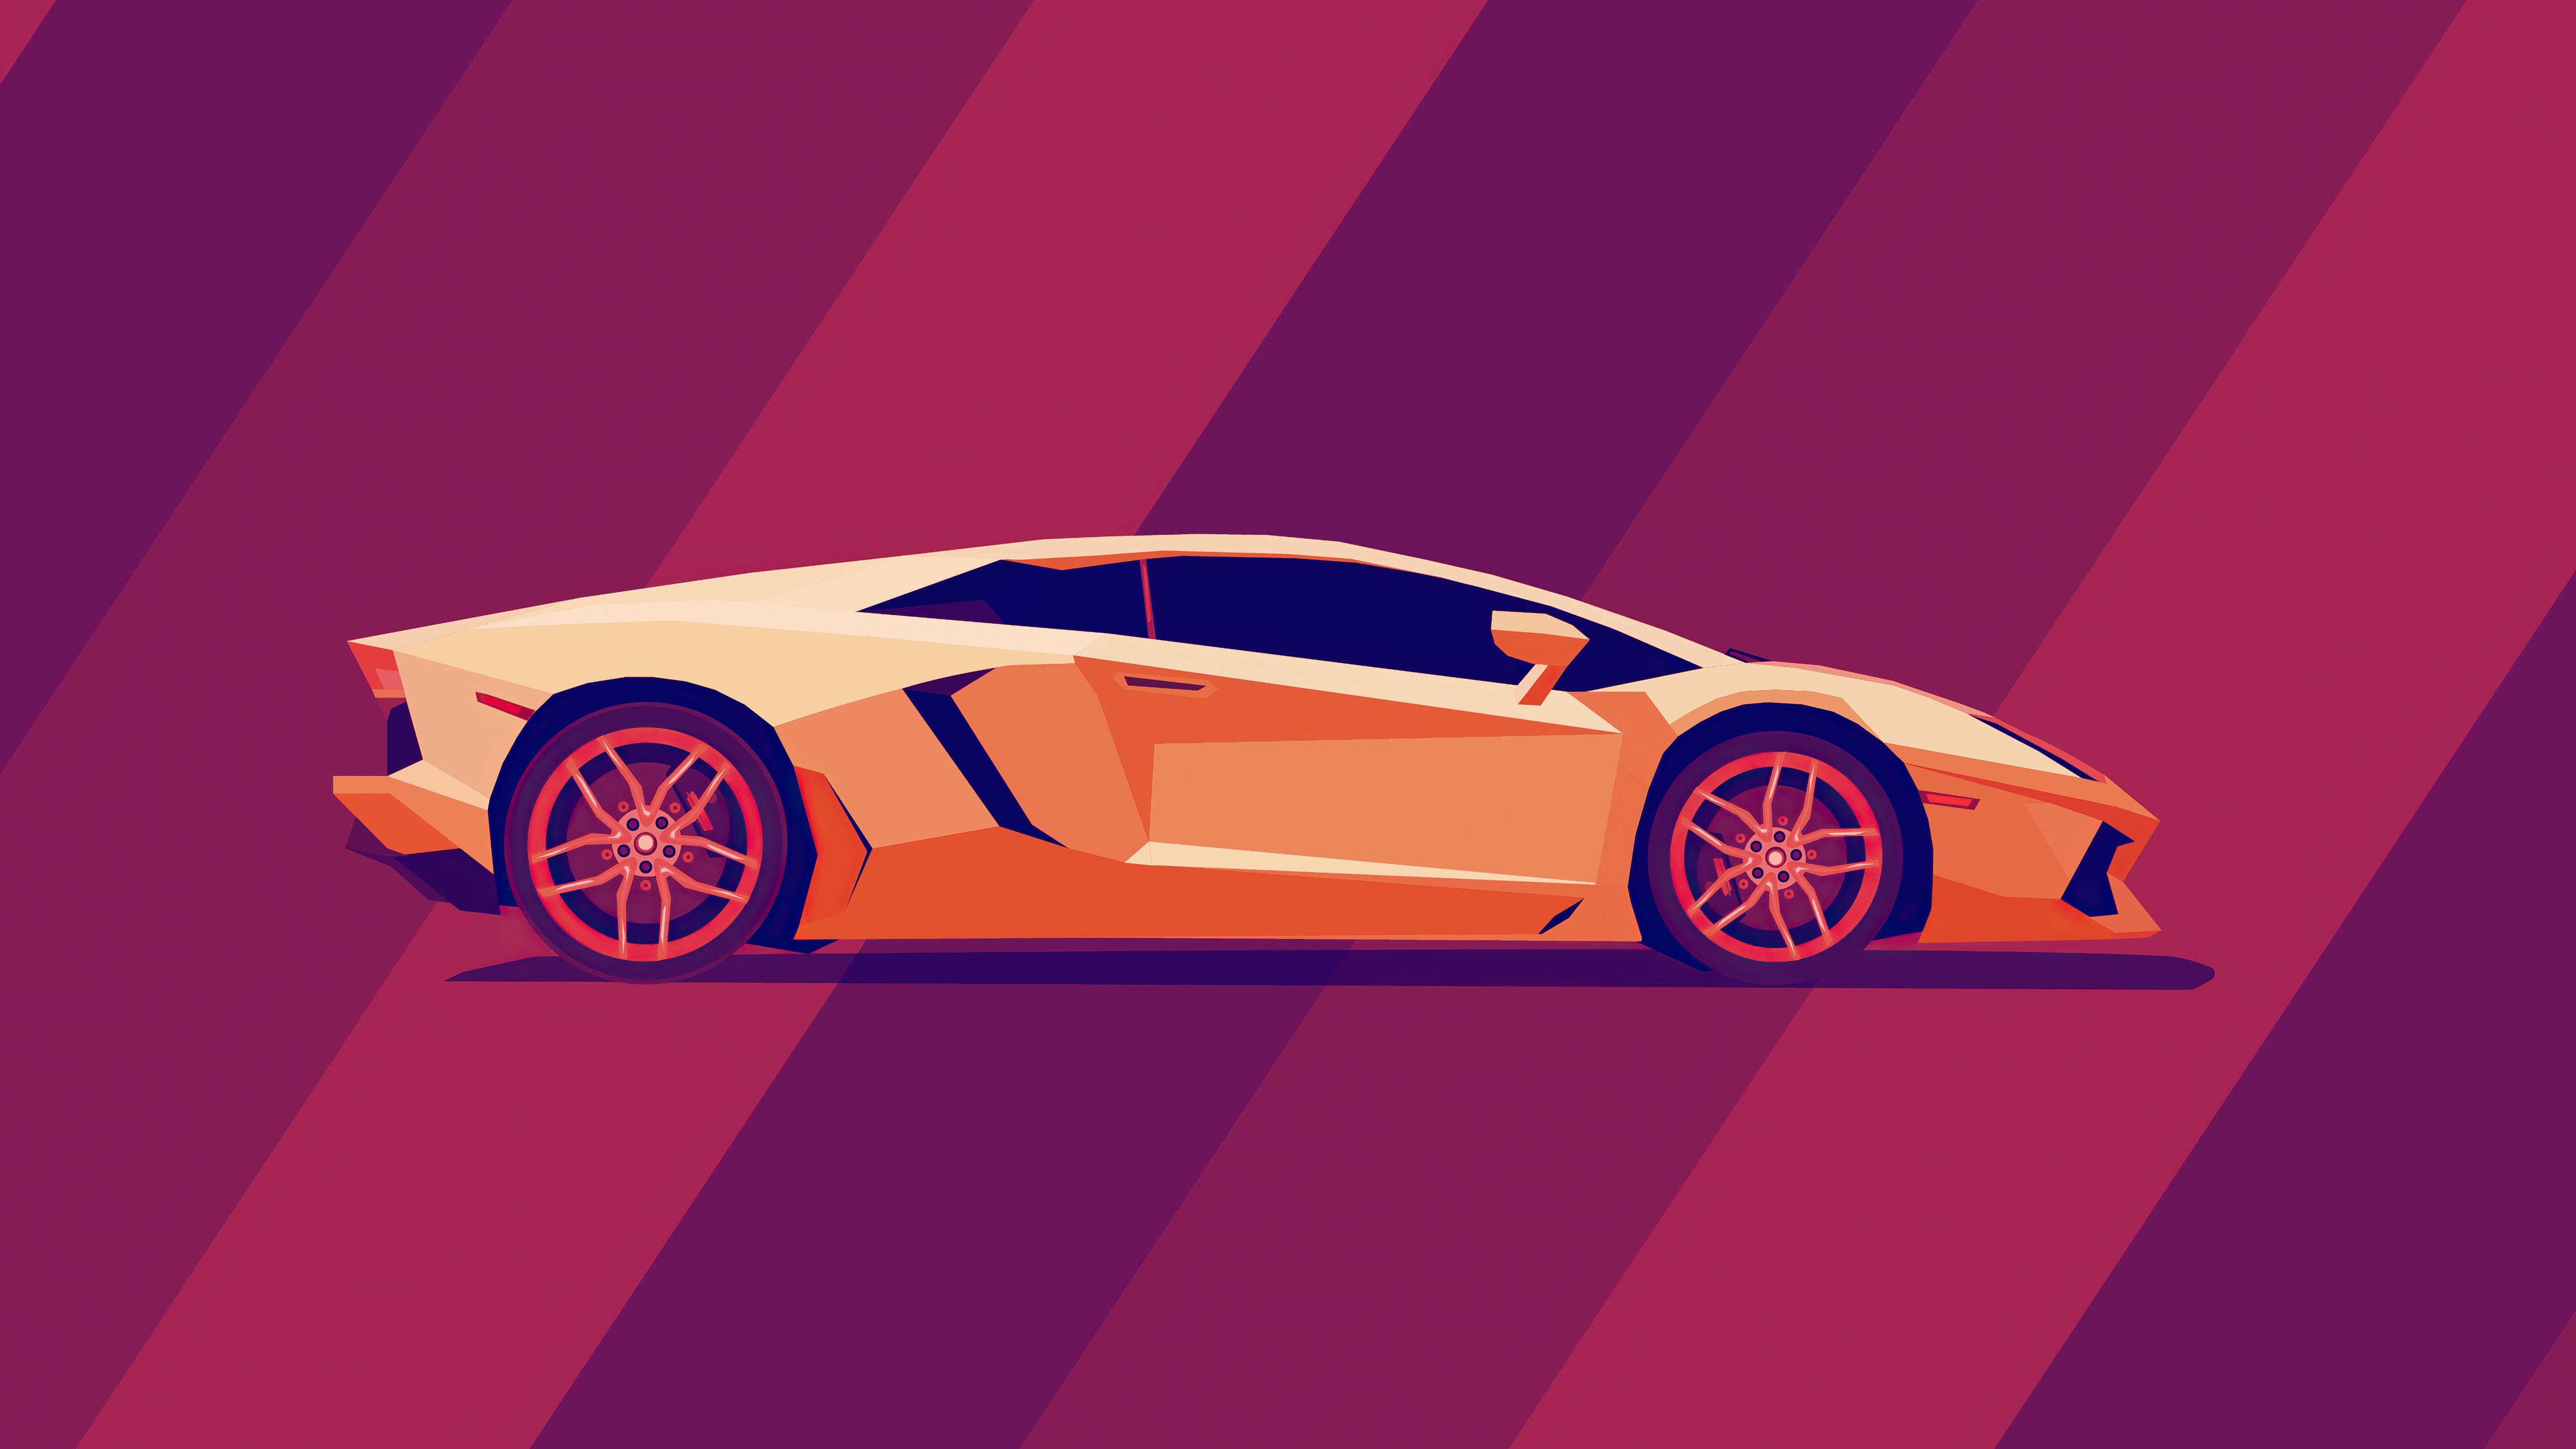 lamborghini abstract 4k 1620170069 - Lamborghini Abstract 4k - Lamborghini Abstract 4k wallpapers